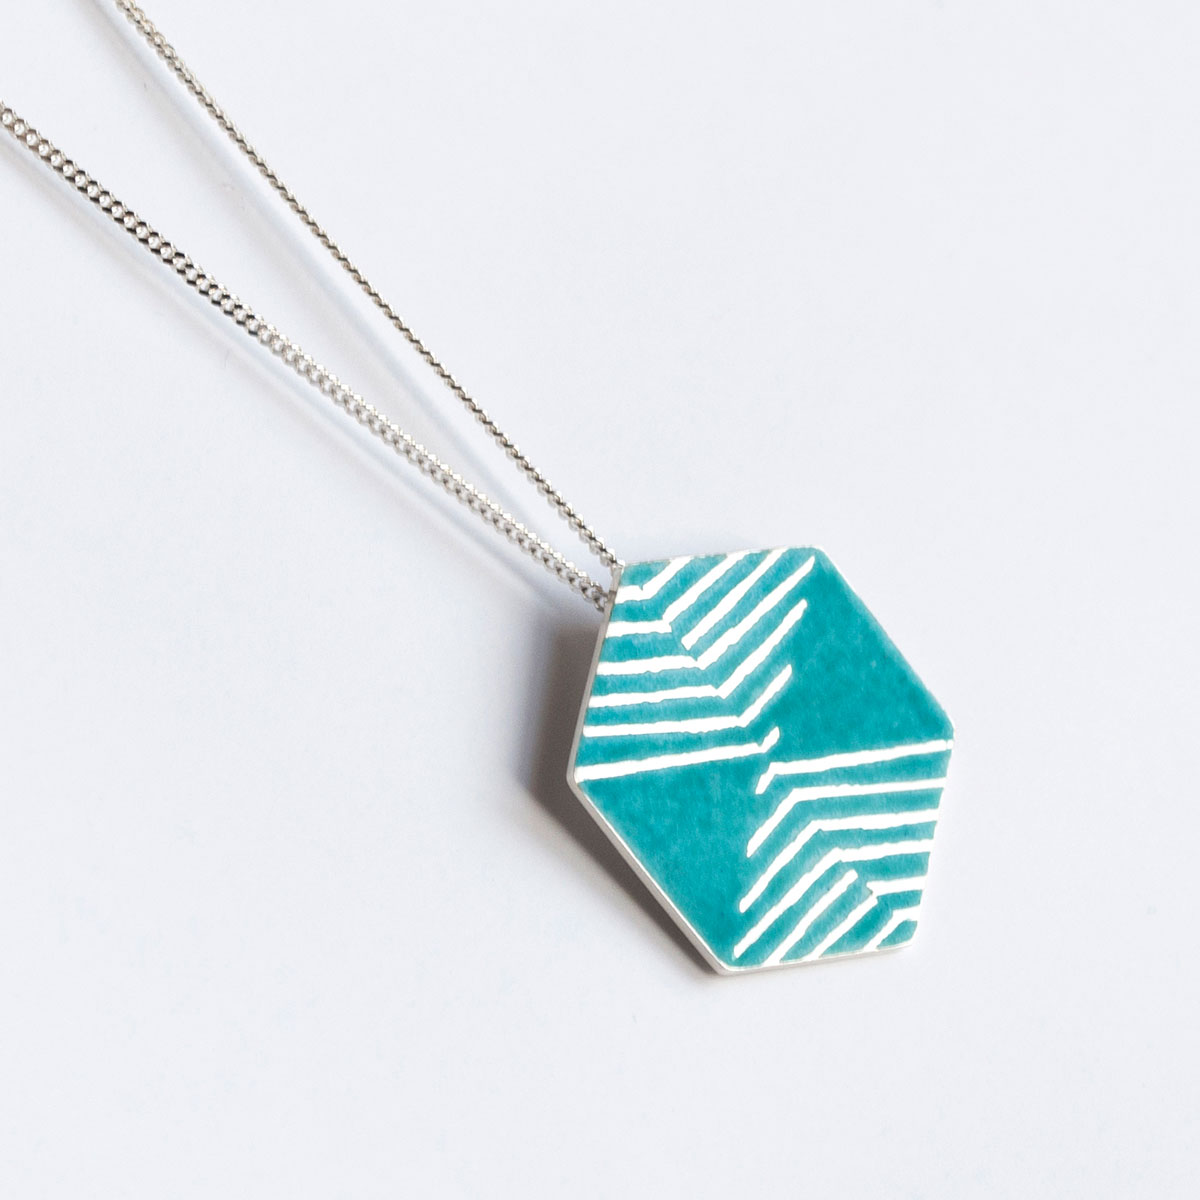 'Weave' Turquoise Hexagonal Pendant, Large